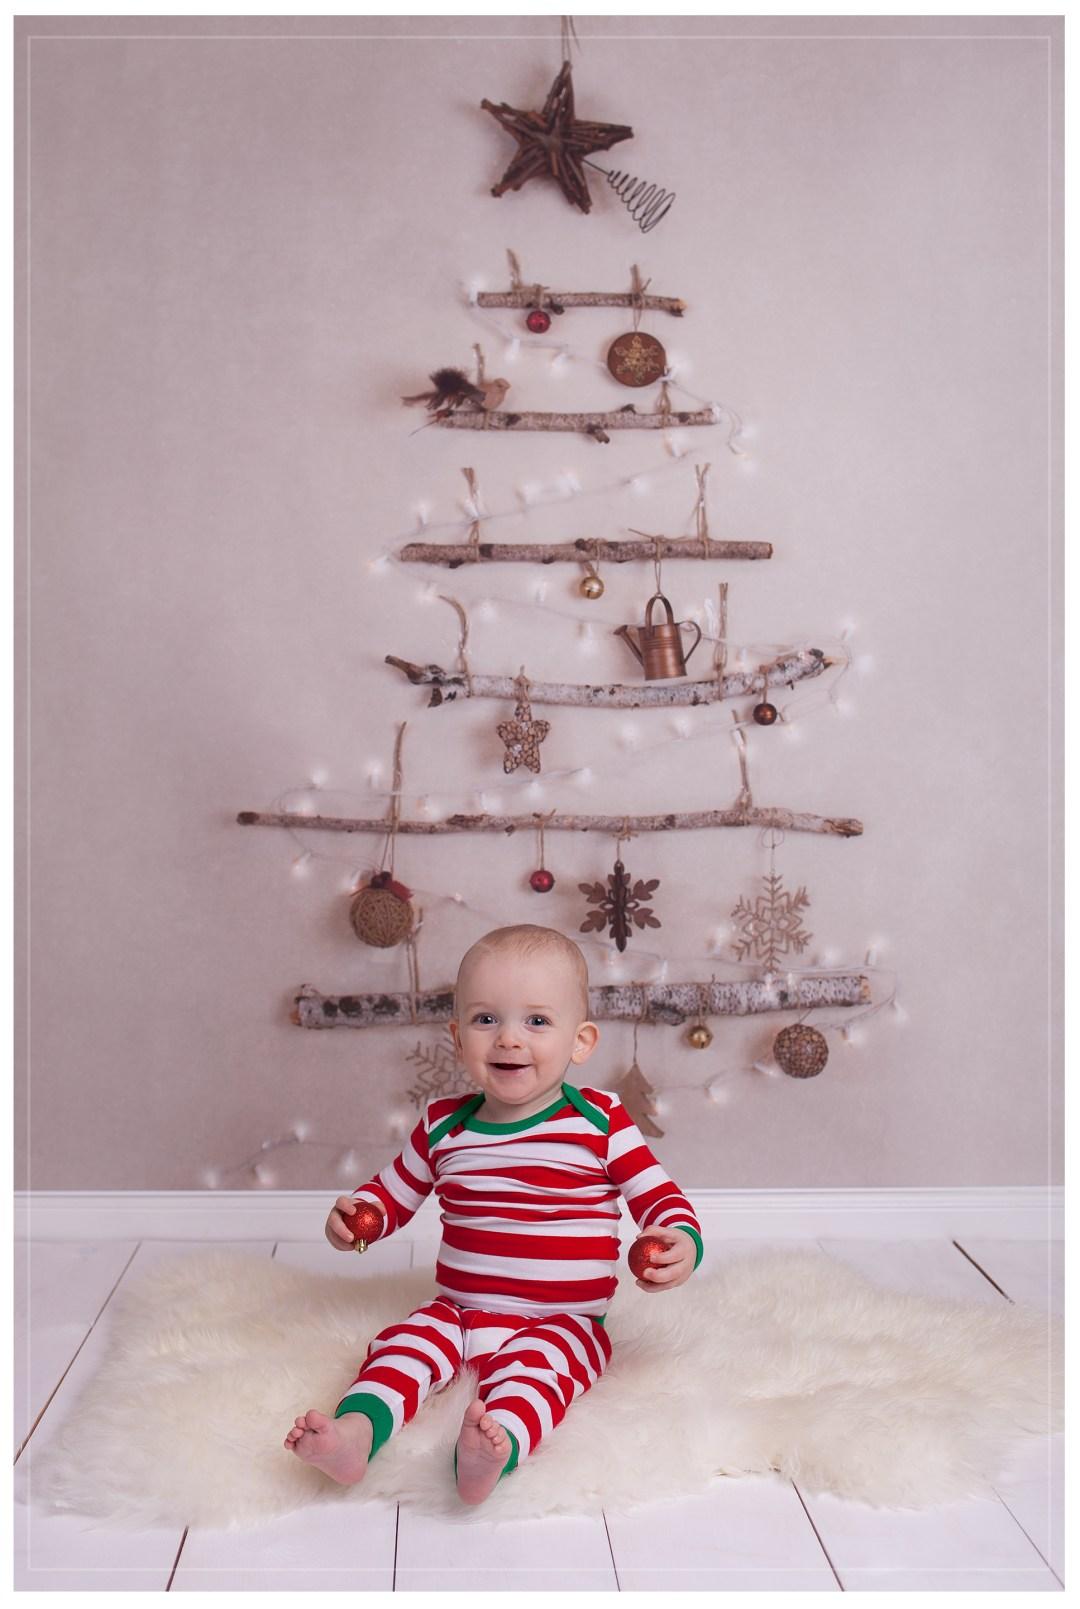 edinburgh christmas photos, edinburgh baby photos, edinburgh photographer, edinburgh newborn photographer, edinburgh kids photographer, baby photos edinburgh